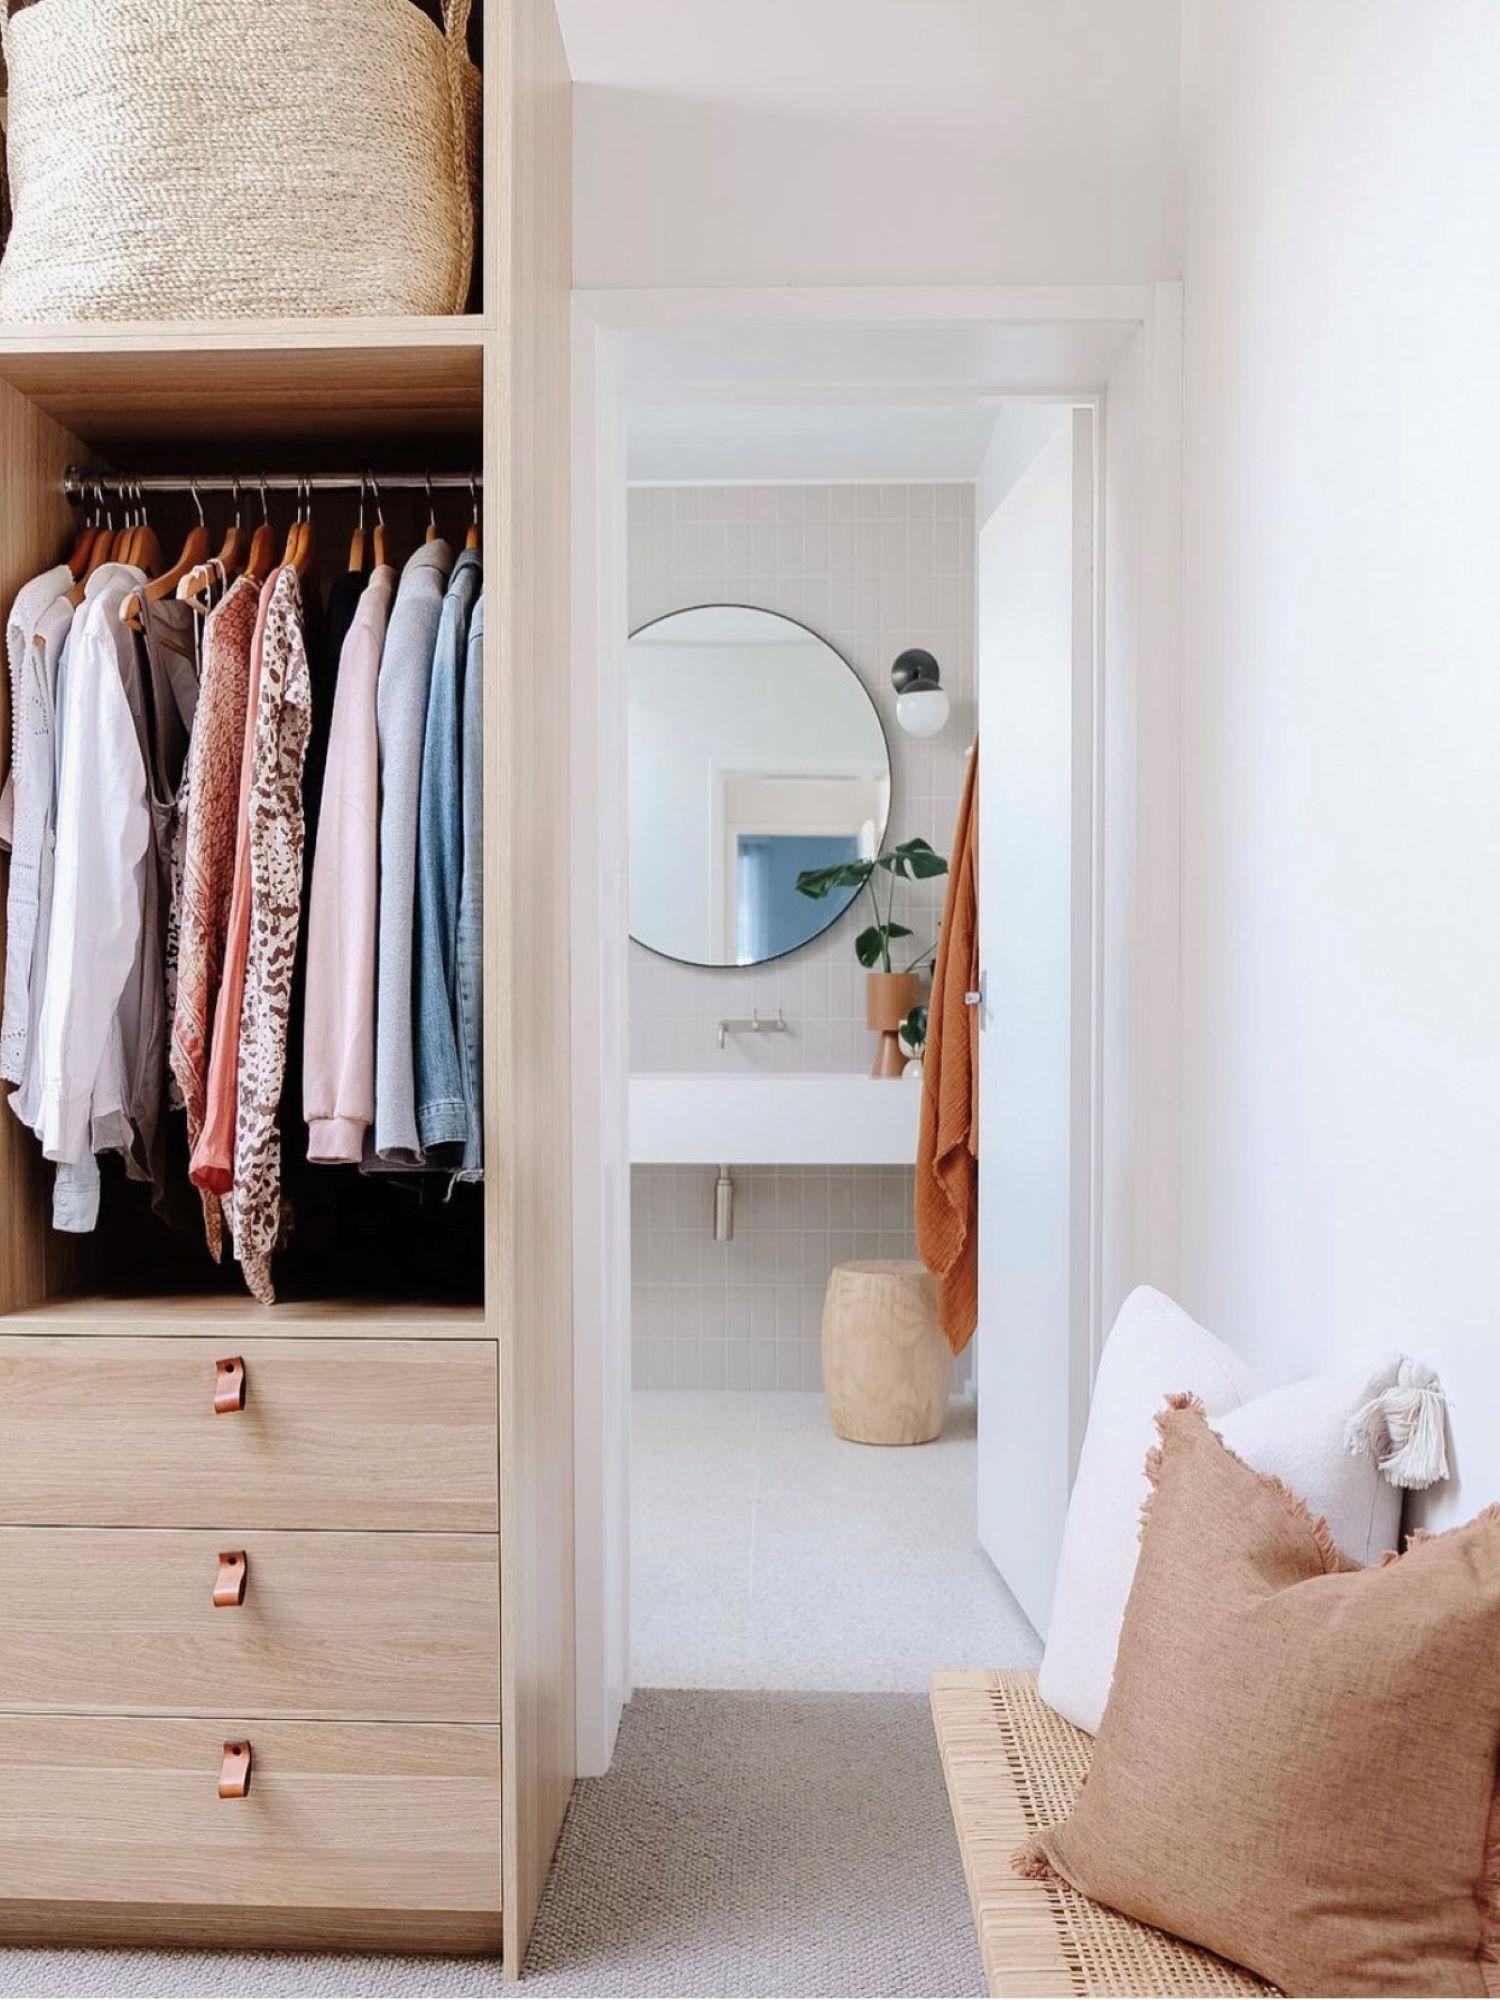 Interior designer Bettina Brent wardrobe and ensuite